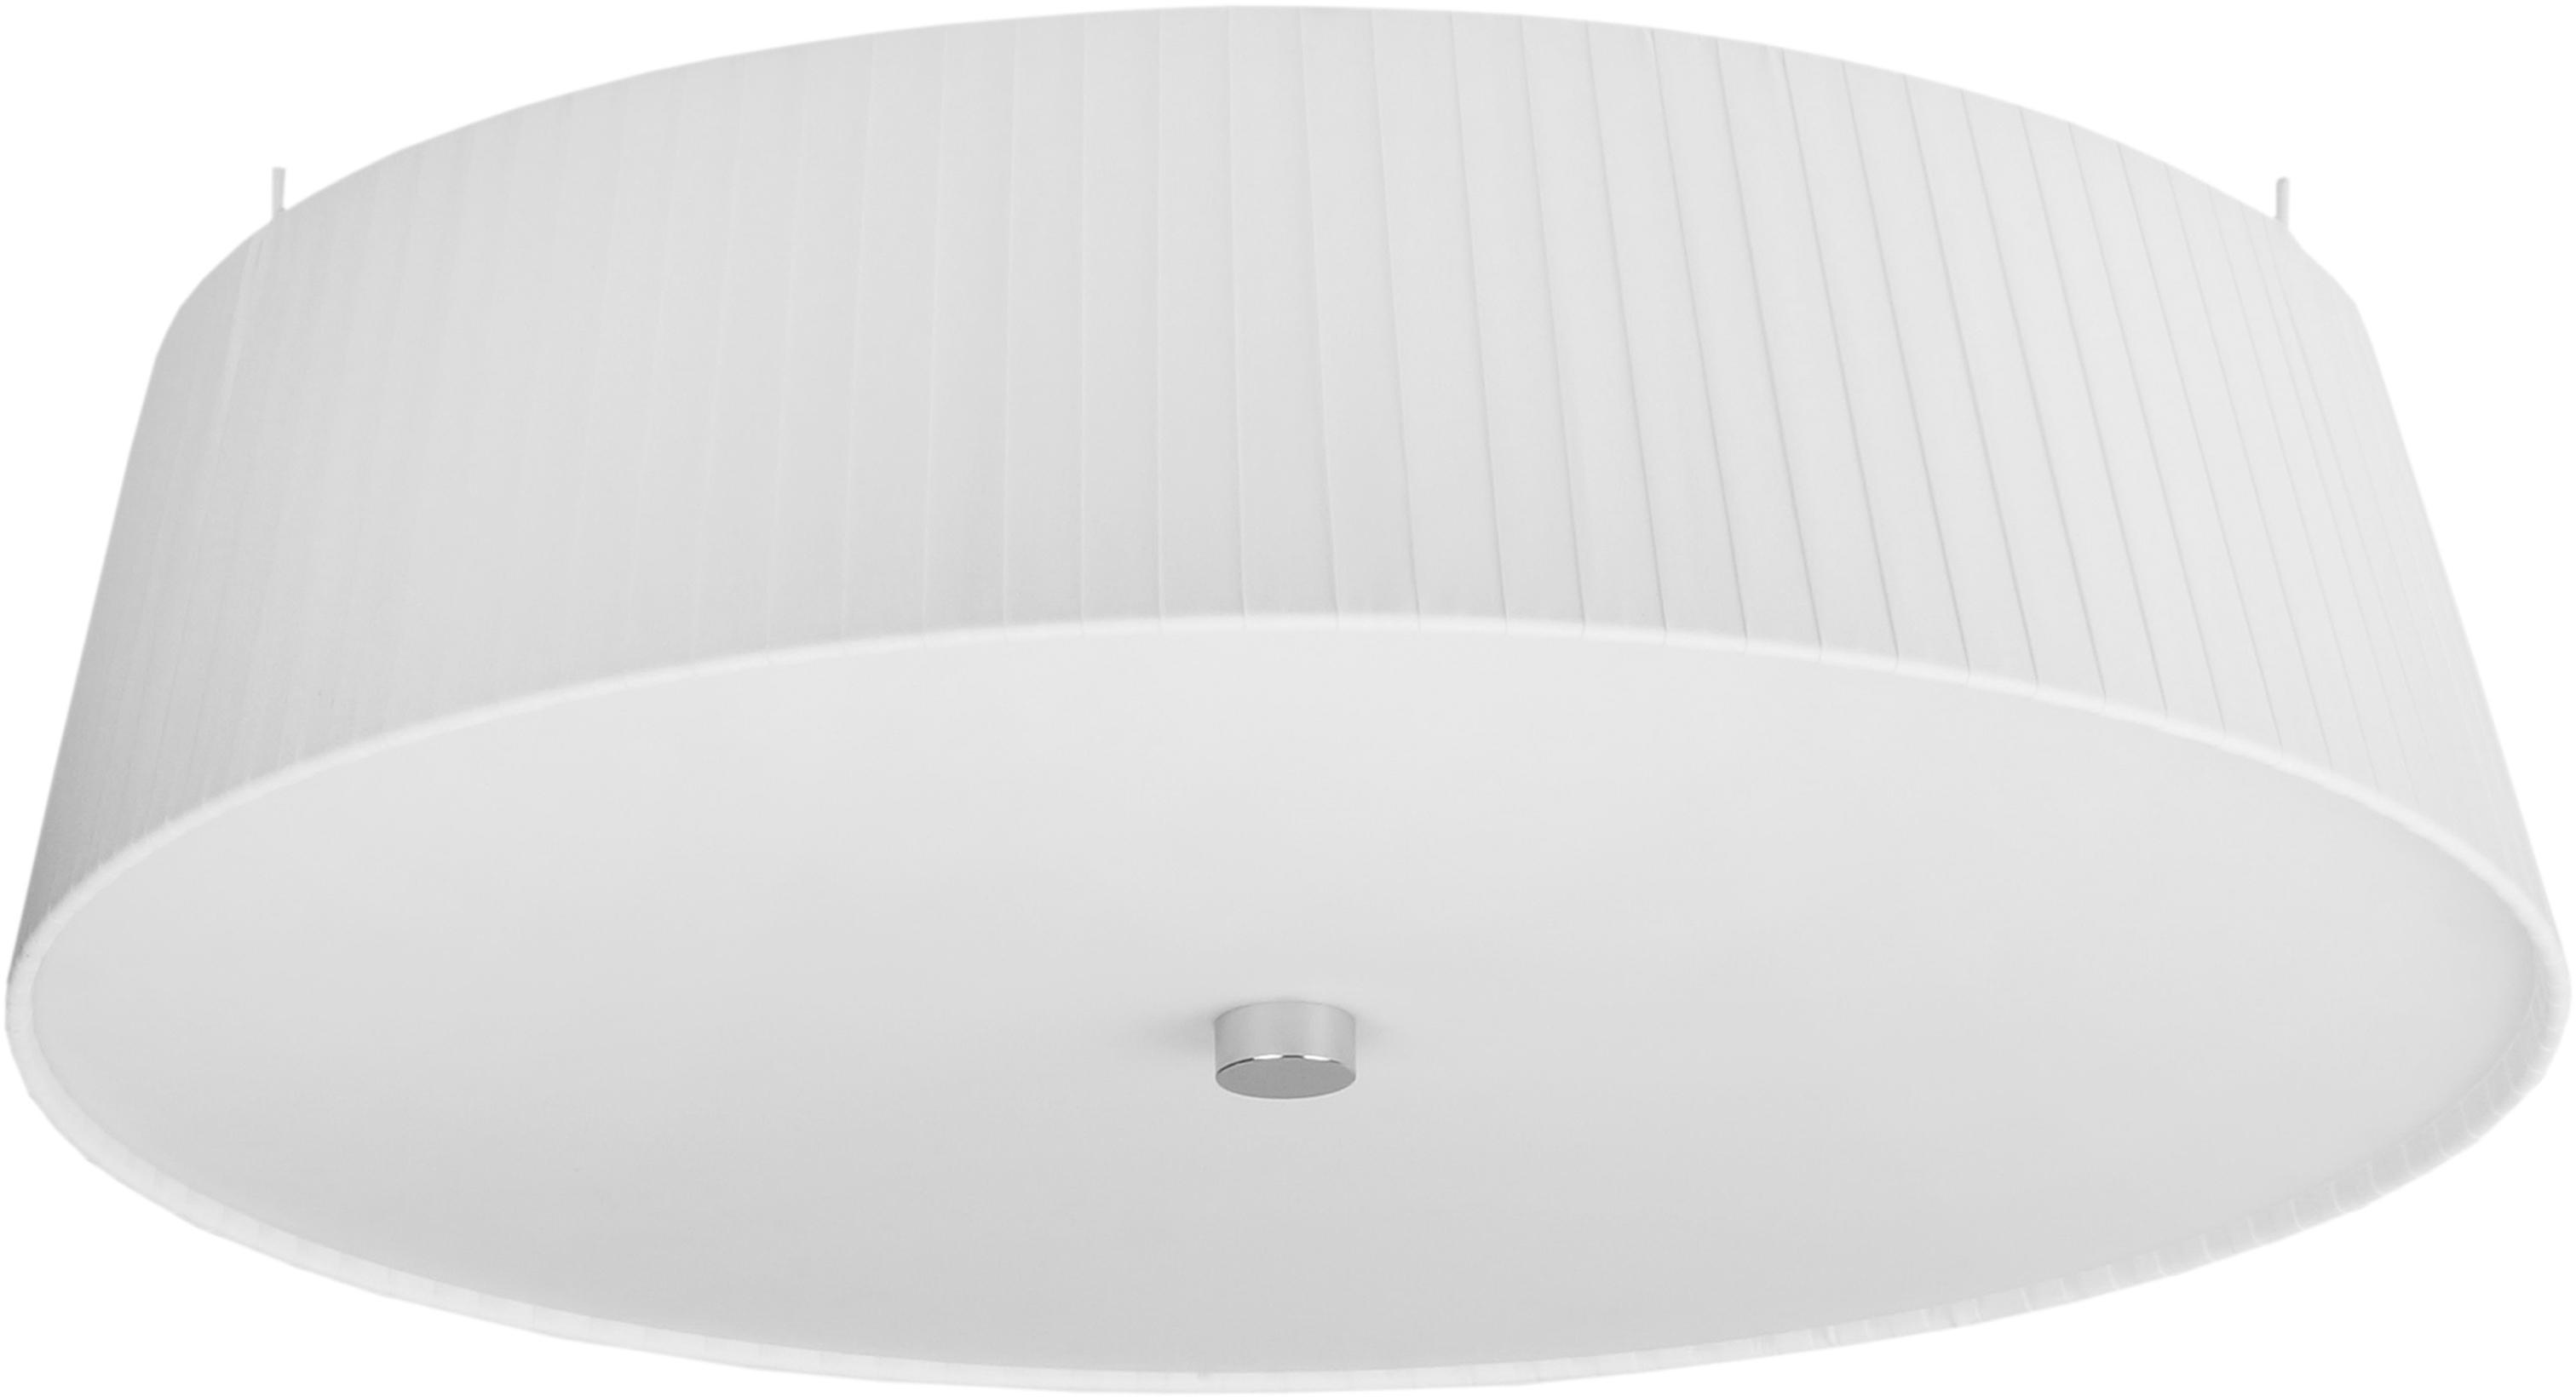 Plafondlamp Kami, Lampenkap: polyester, Diffuser: glas, Lampenkap: wit. Diffuser: wit, Ø 45 cm